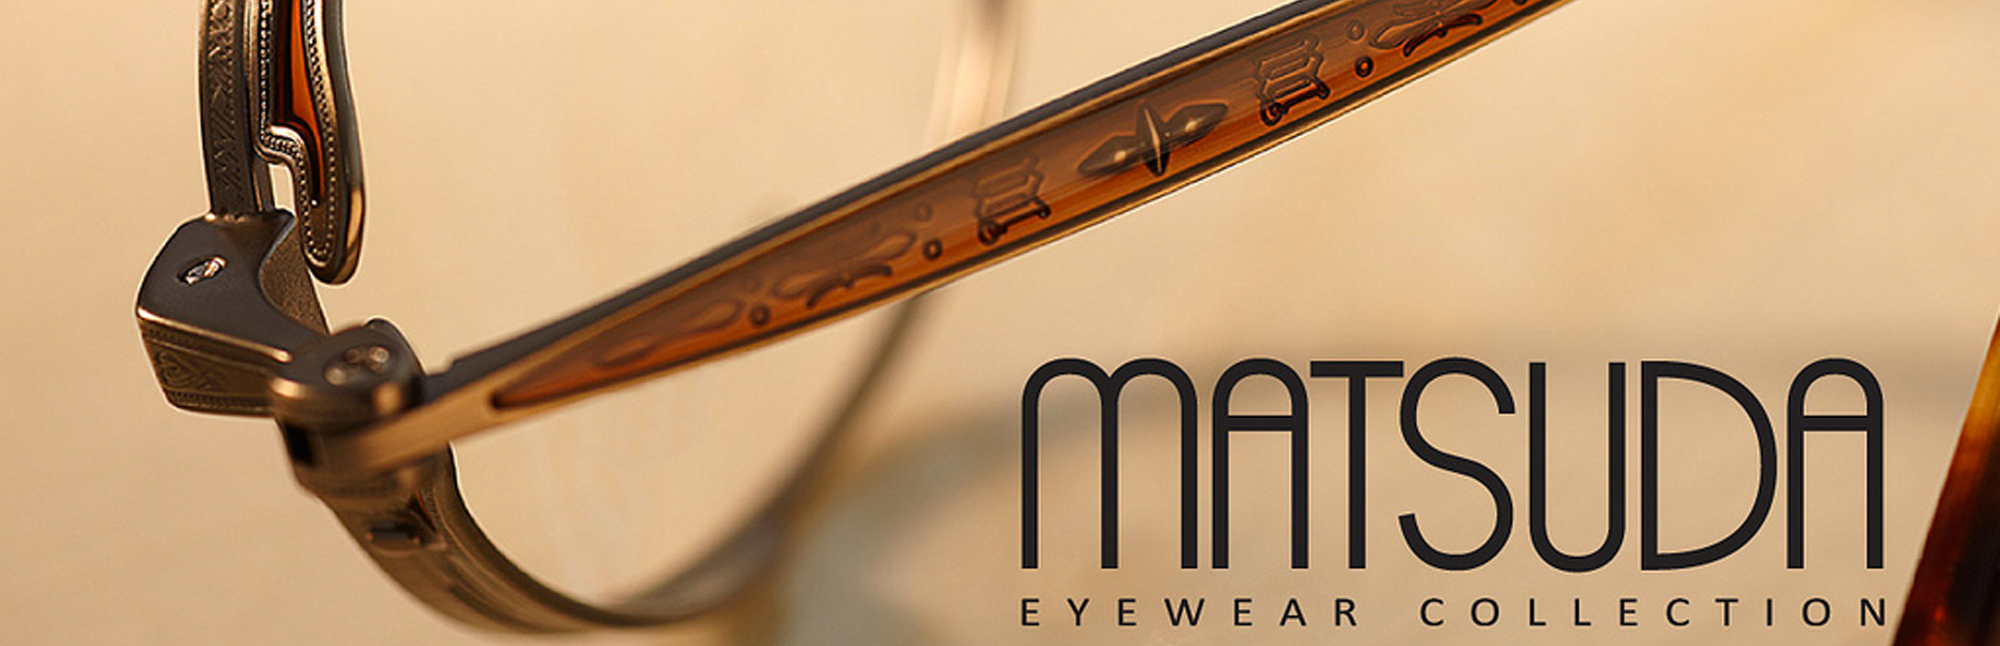 5ed151fad09c Read About MATSUDA Eyewear